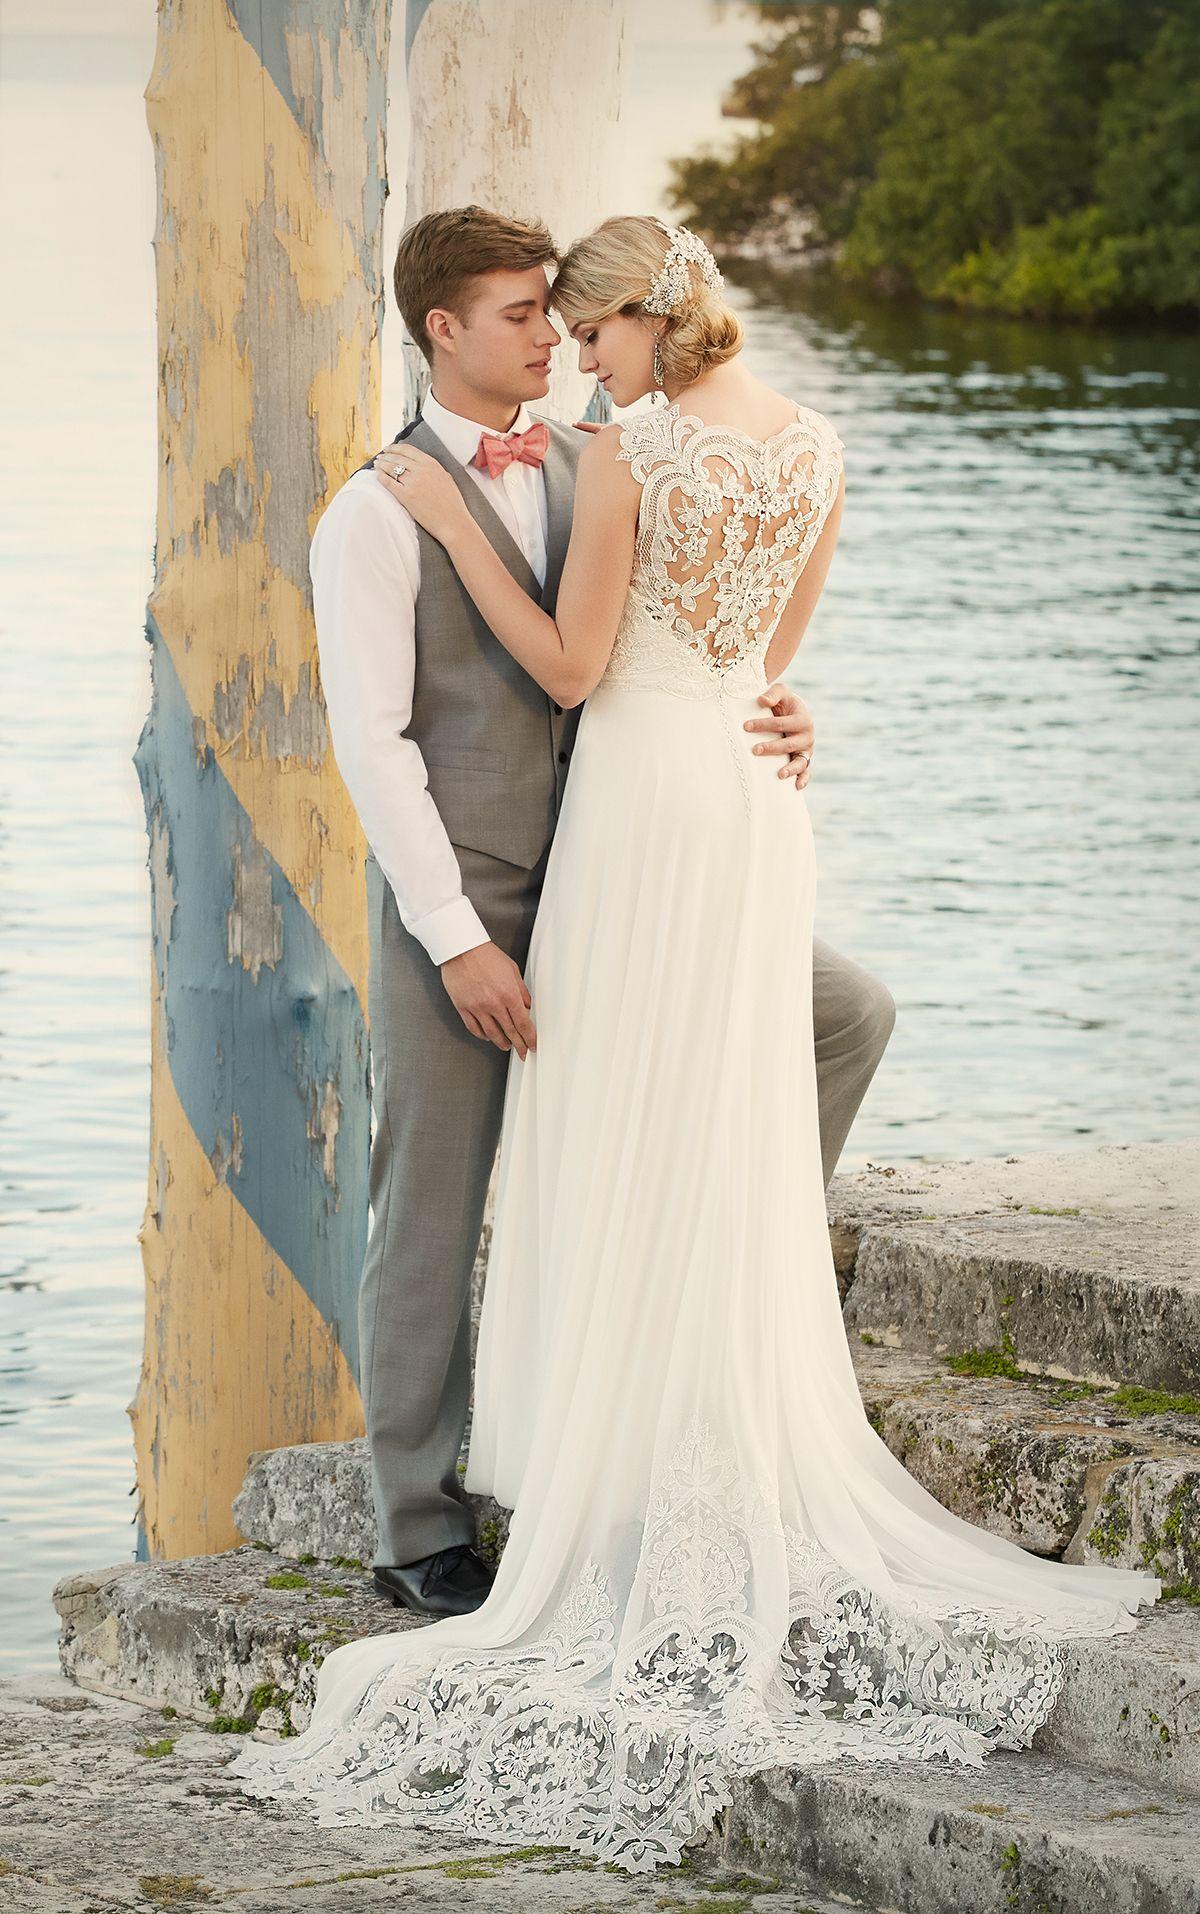 Designer Beach Wedding Dress by